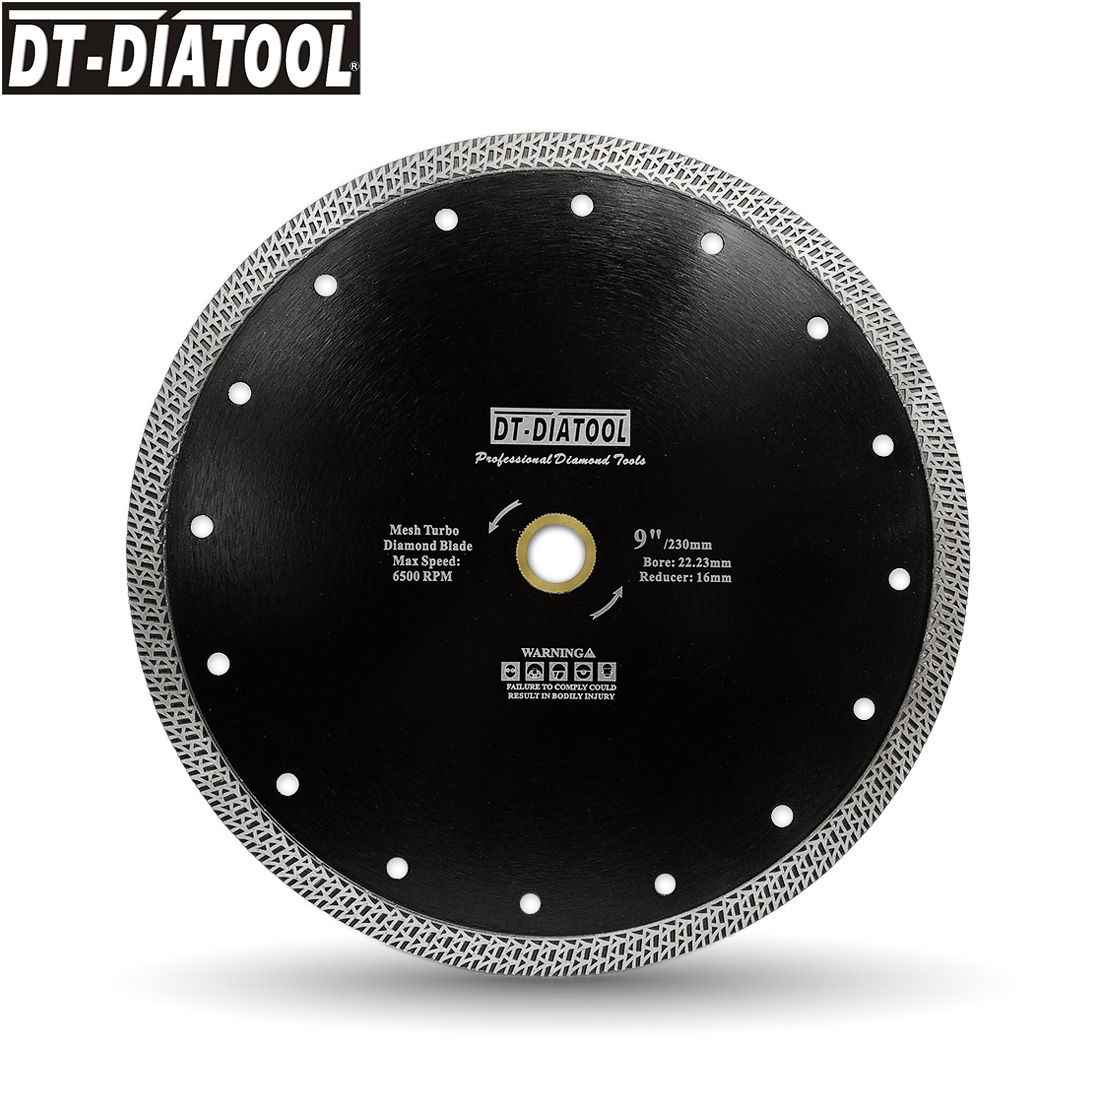 DT-DIATOOL 1pc Dia 230mm/9